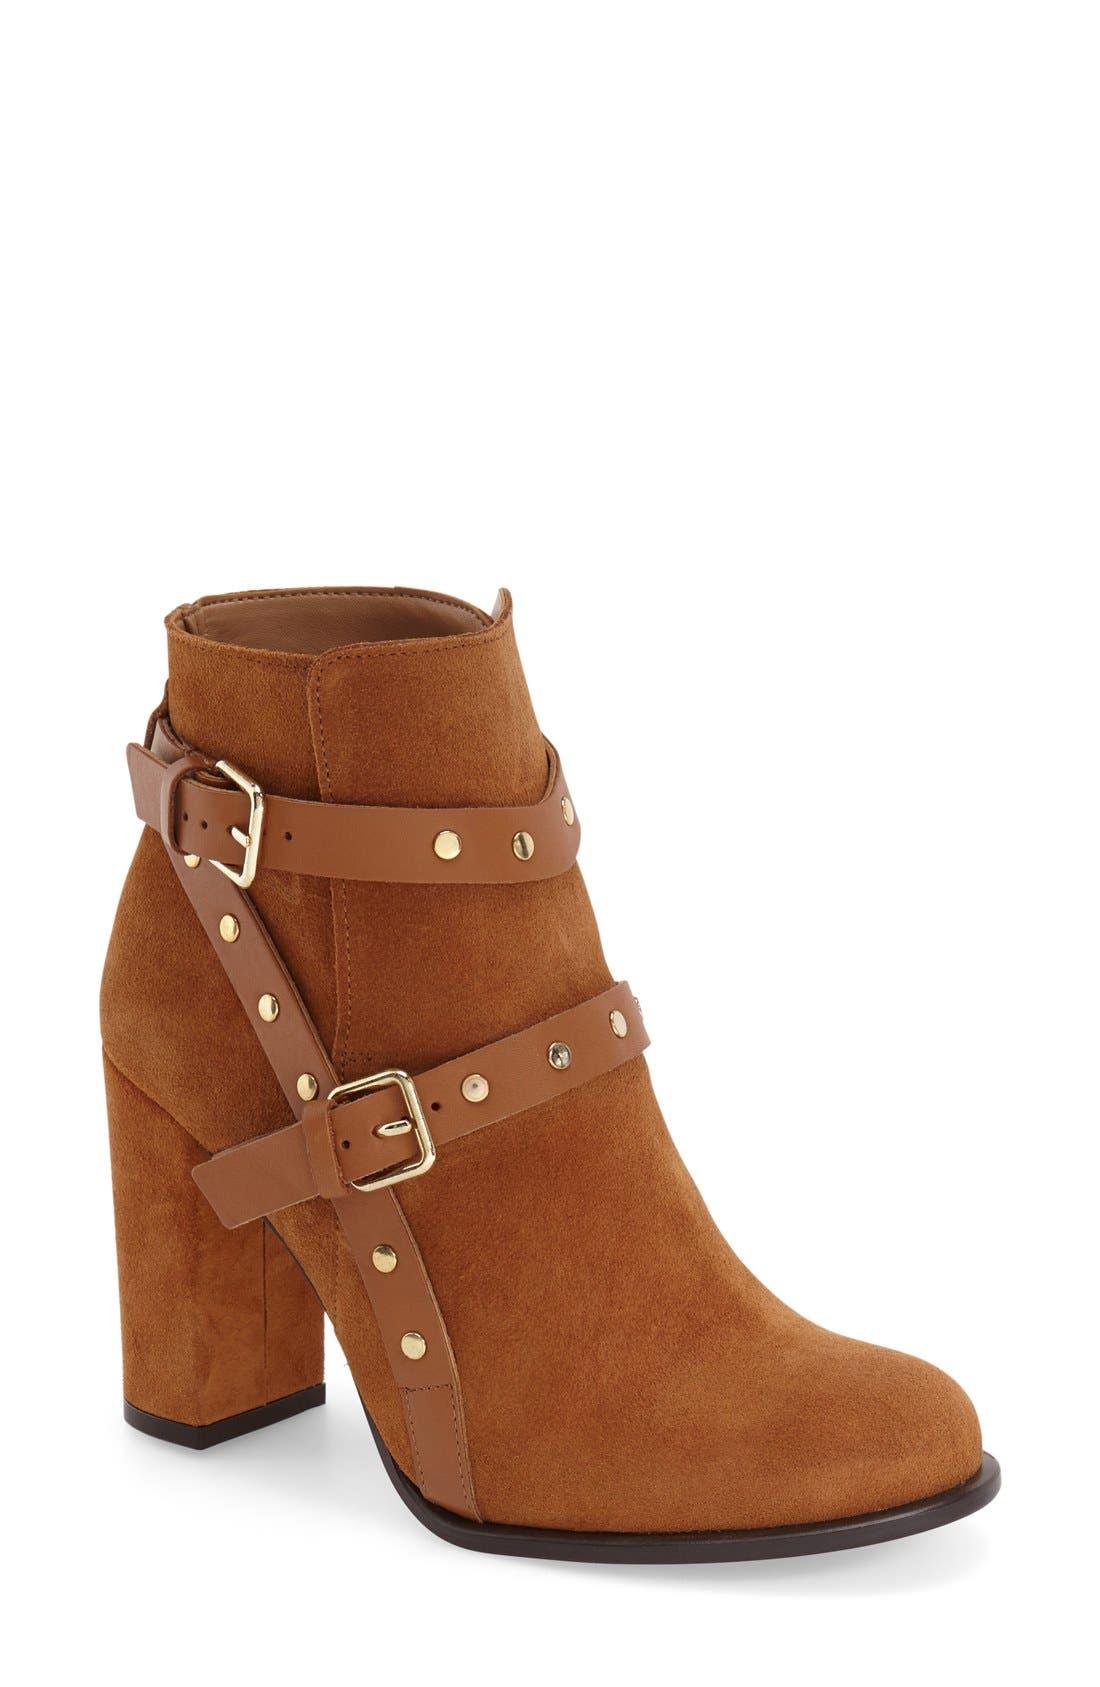 Main Image - Topshop 'Harriett' Stud Strap Boot (Women)